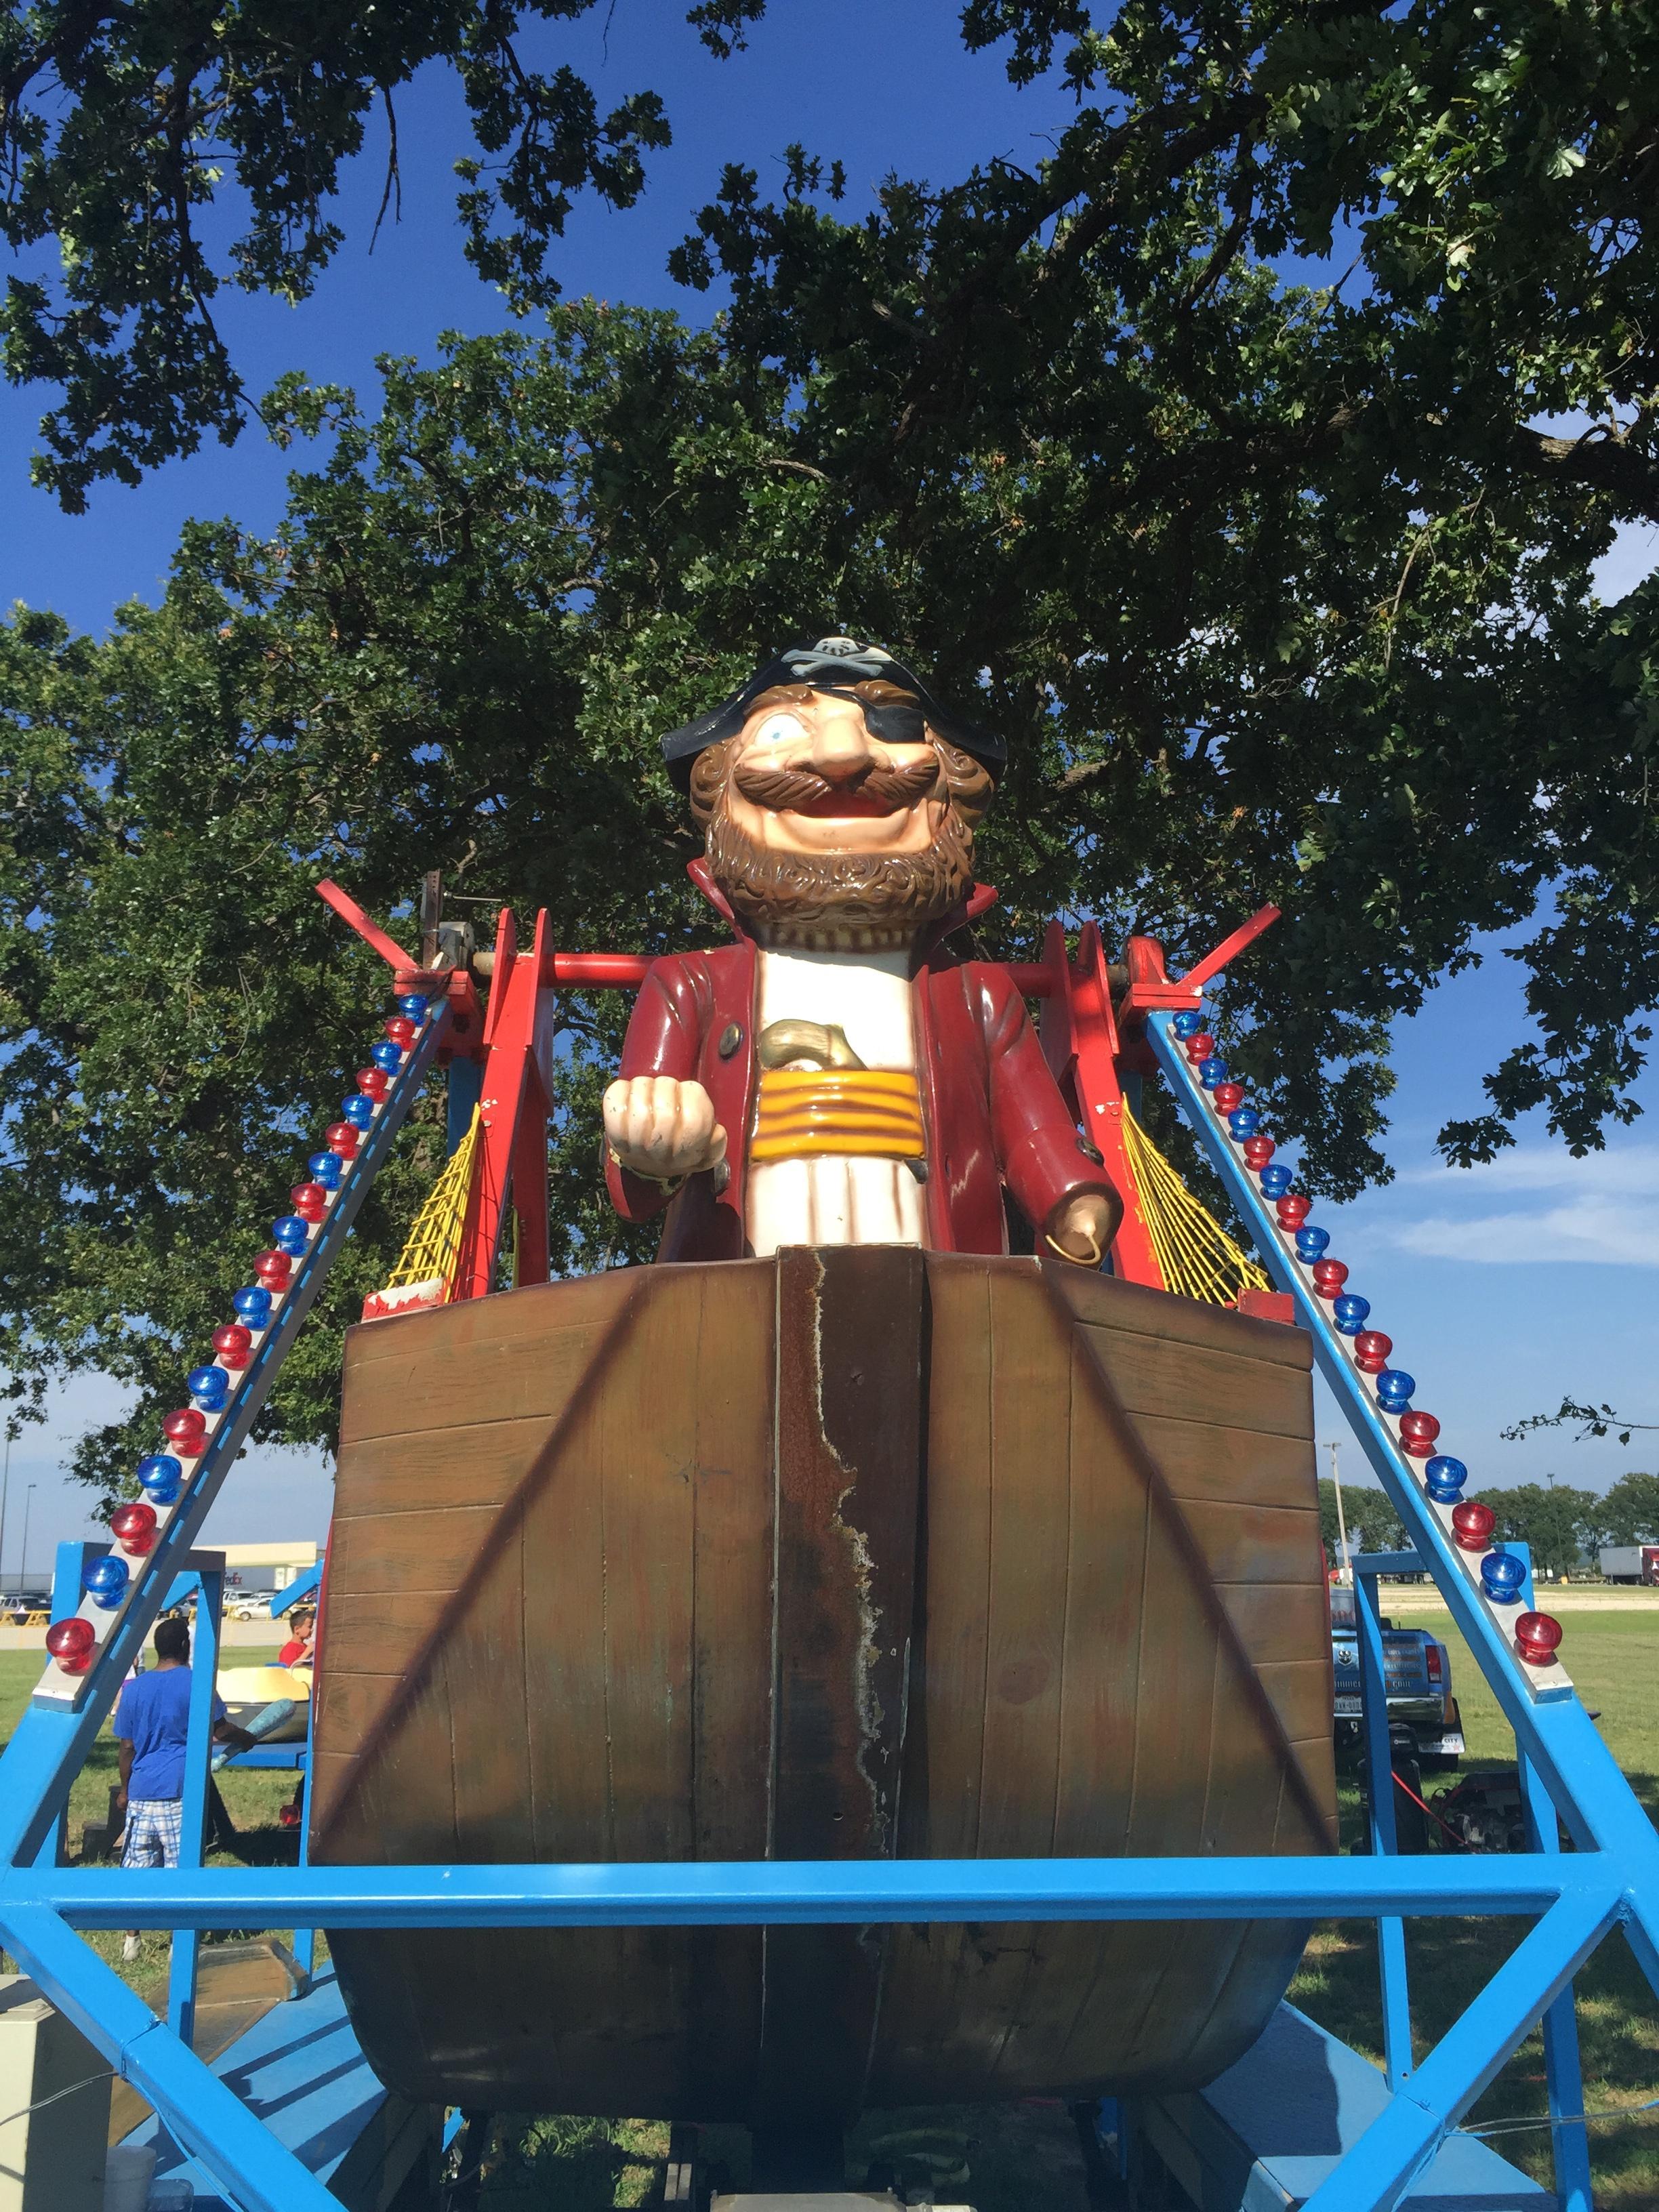 Pirate Ship Carnival Rides Carnival Ride Rentals Clown